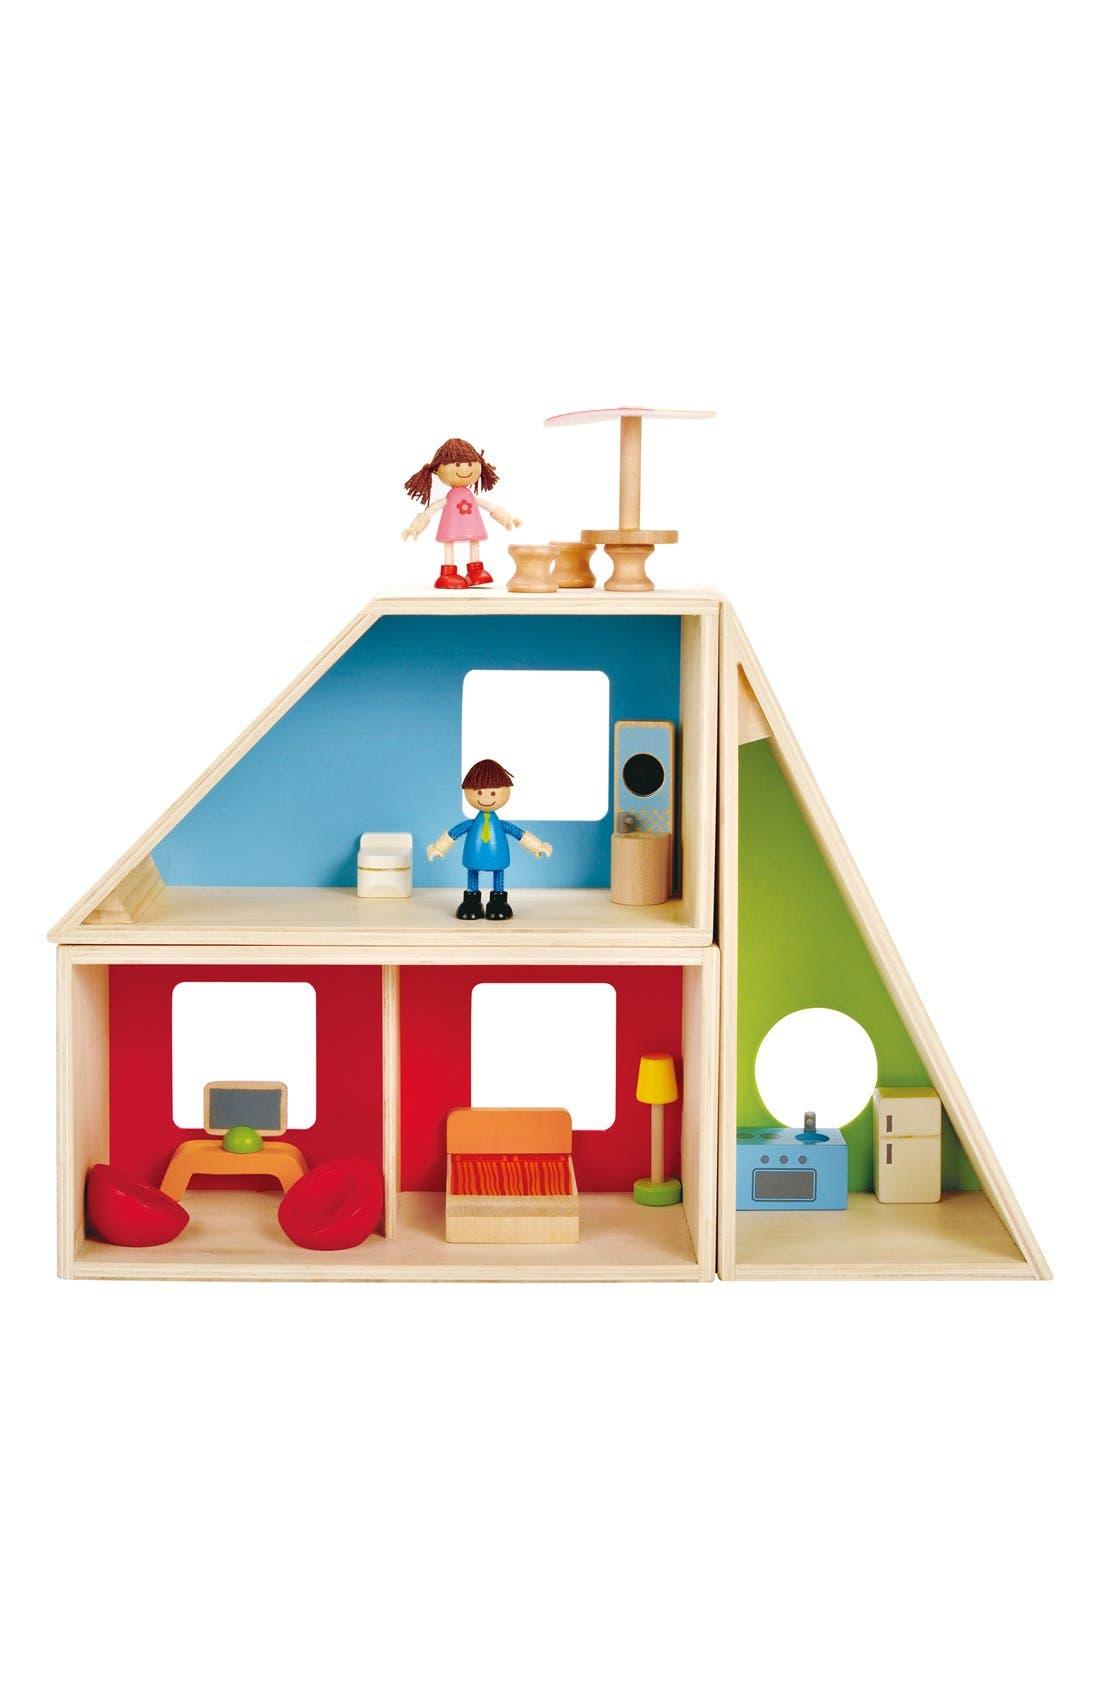 Alternate Image 1 Selected - Hape Geometric Play House